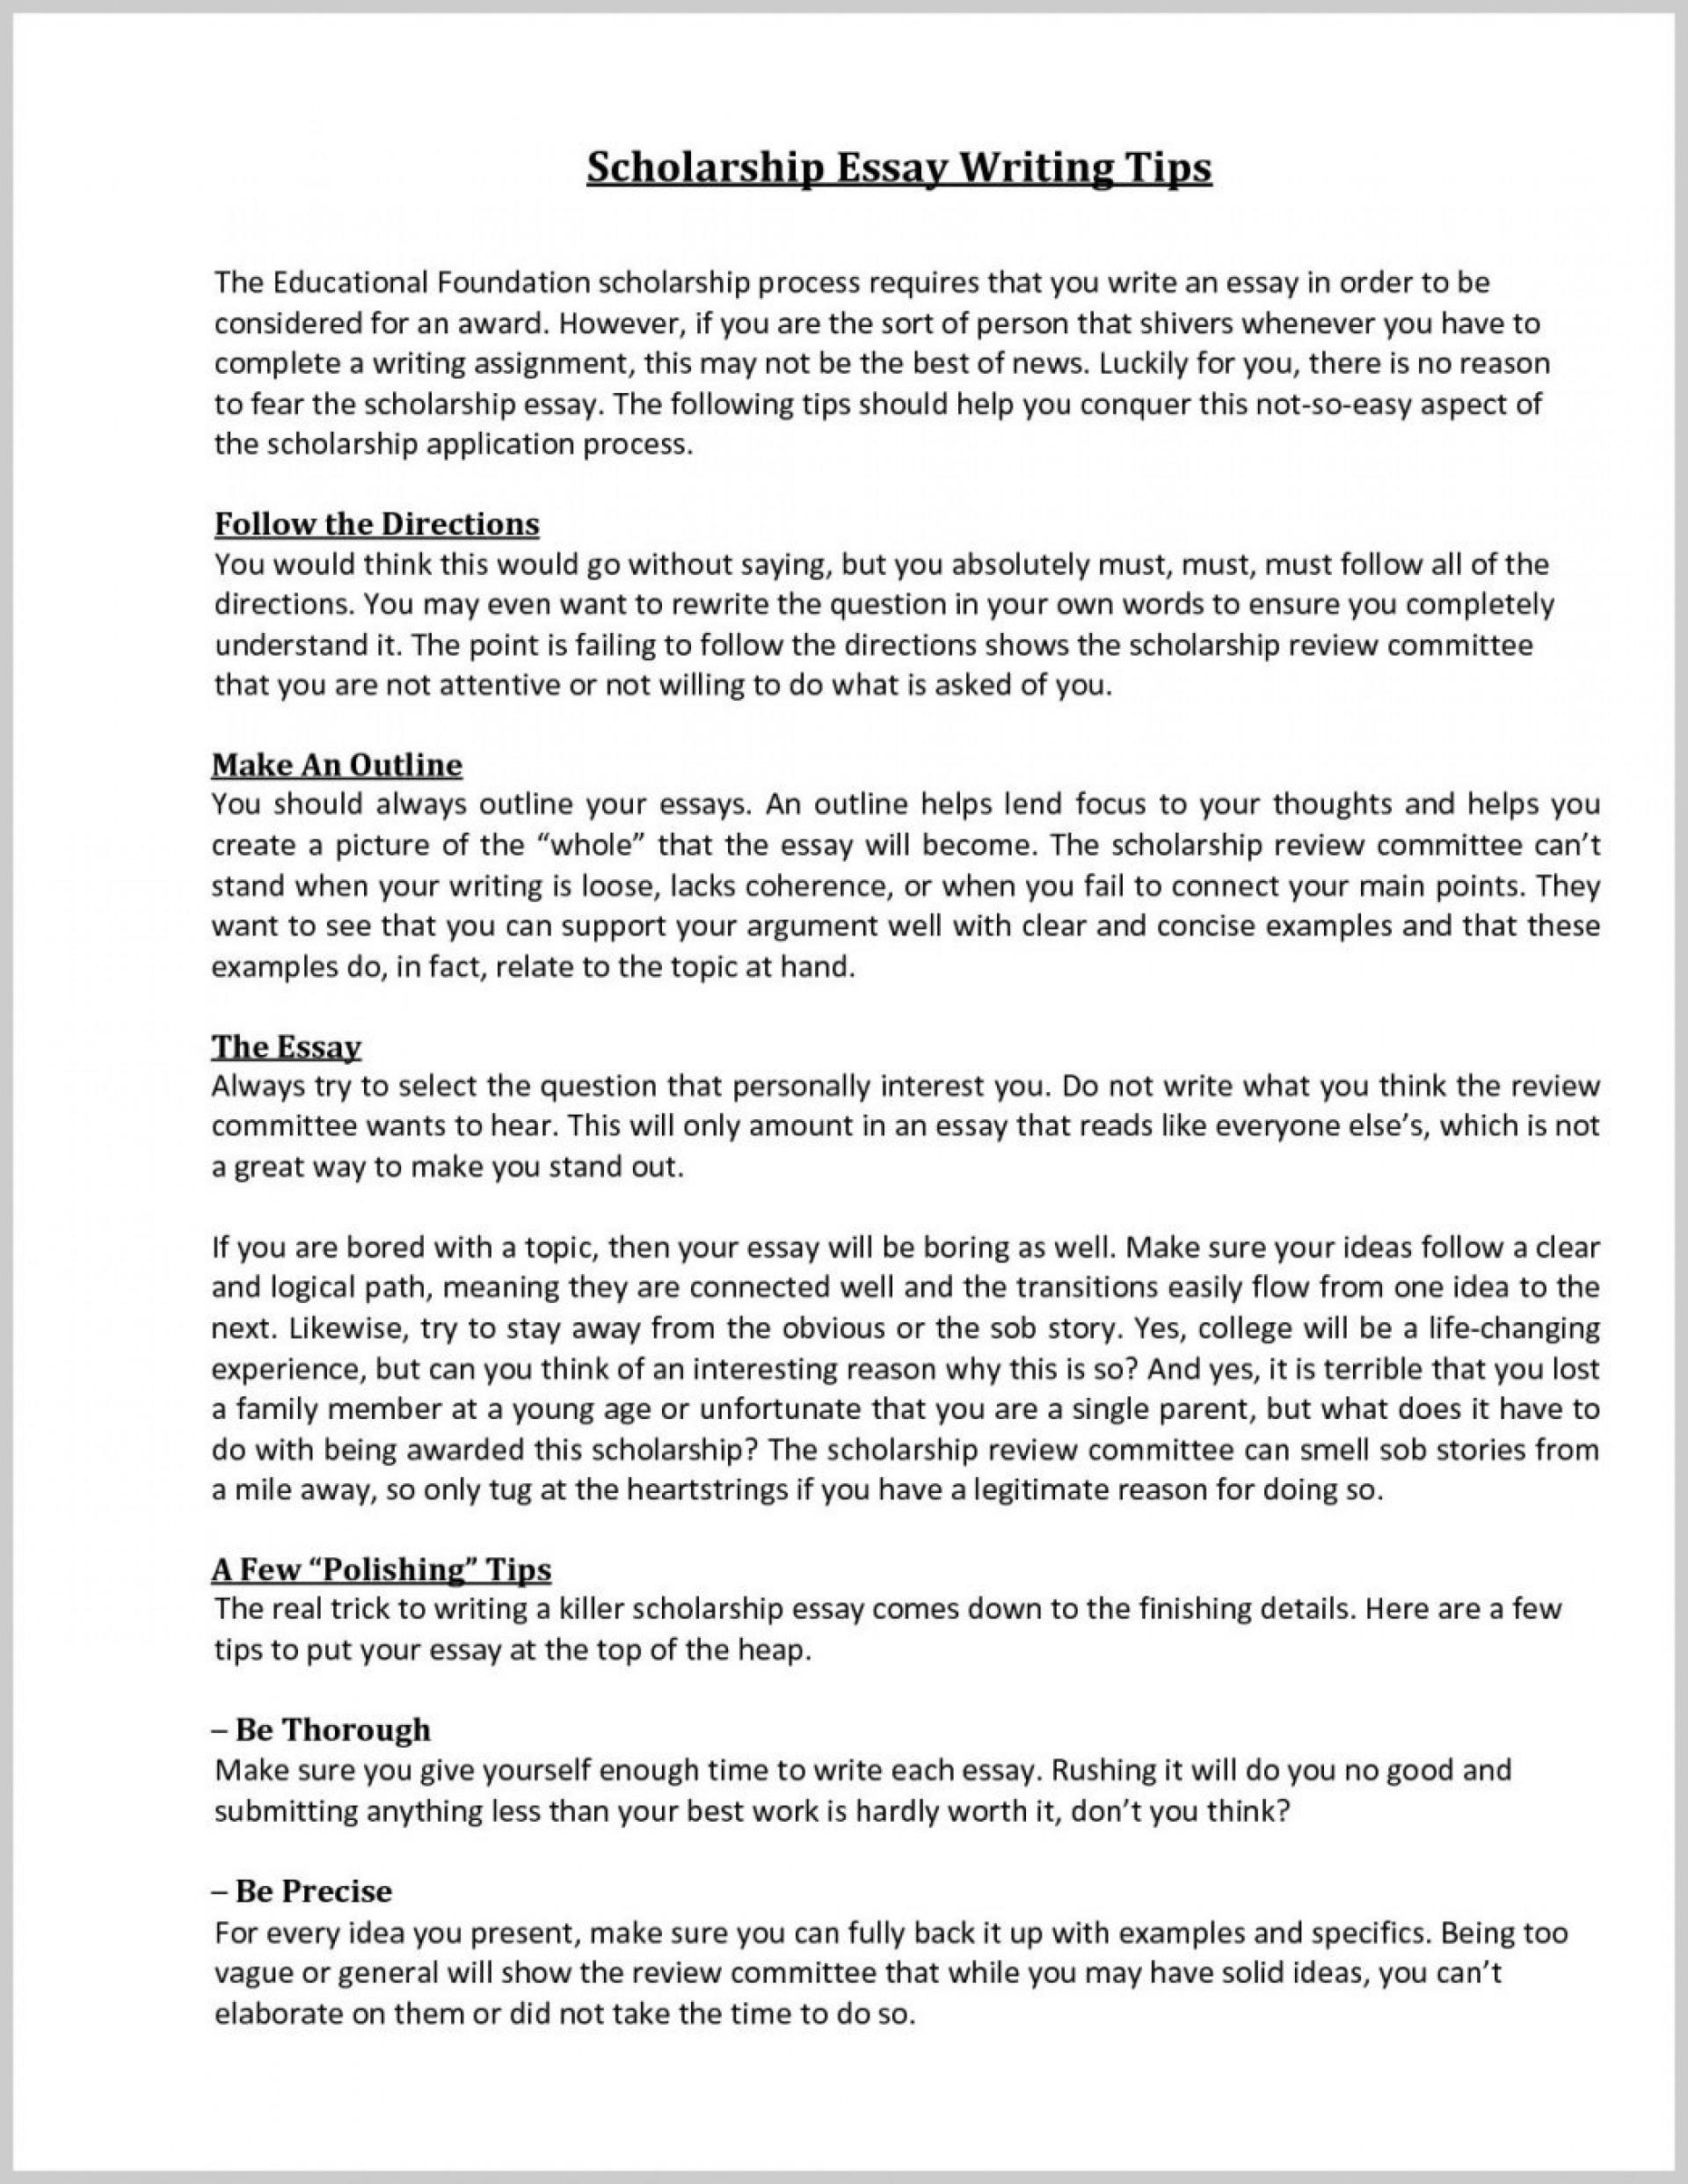 003 Showcase My Attitude Towards Money Essay Resume Ideas I Want To Write Essays For On Happiness Brave New W 1048x1356 Best Uni College Scholarship 1920